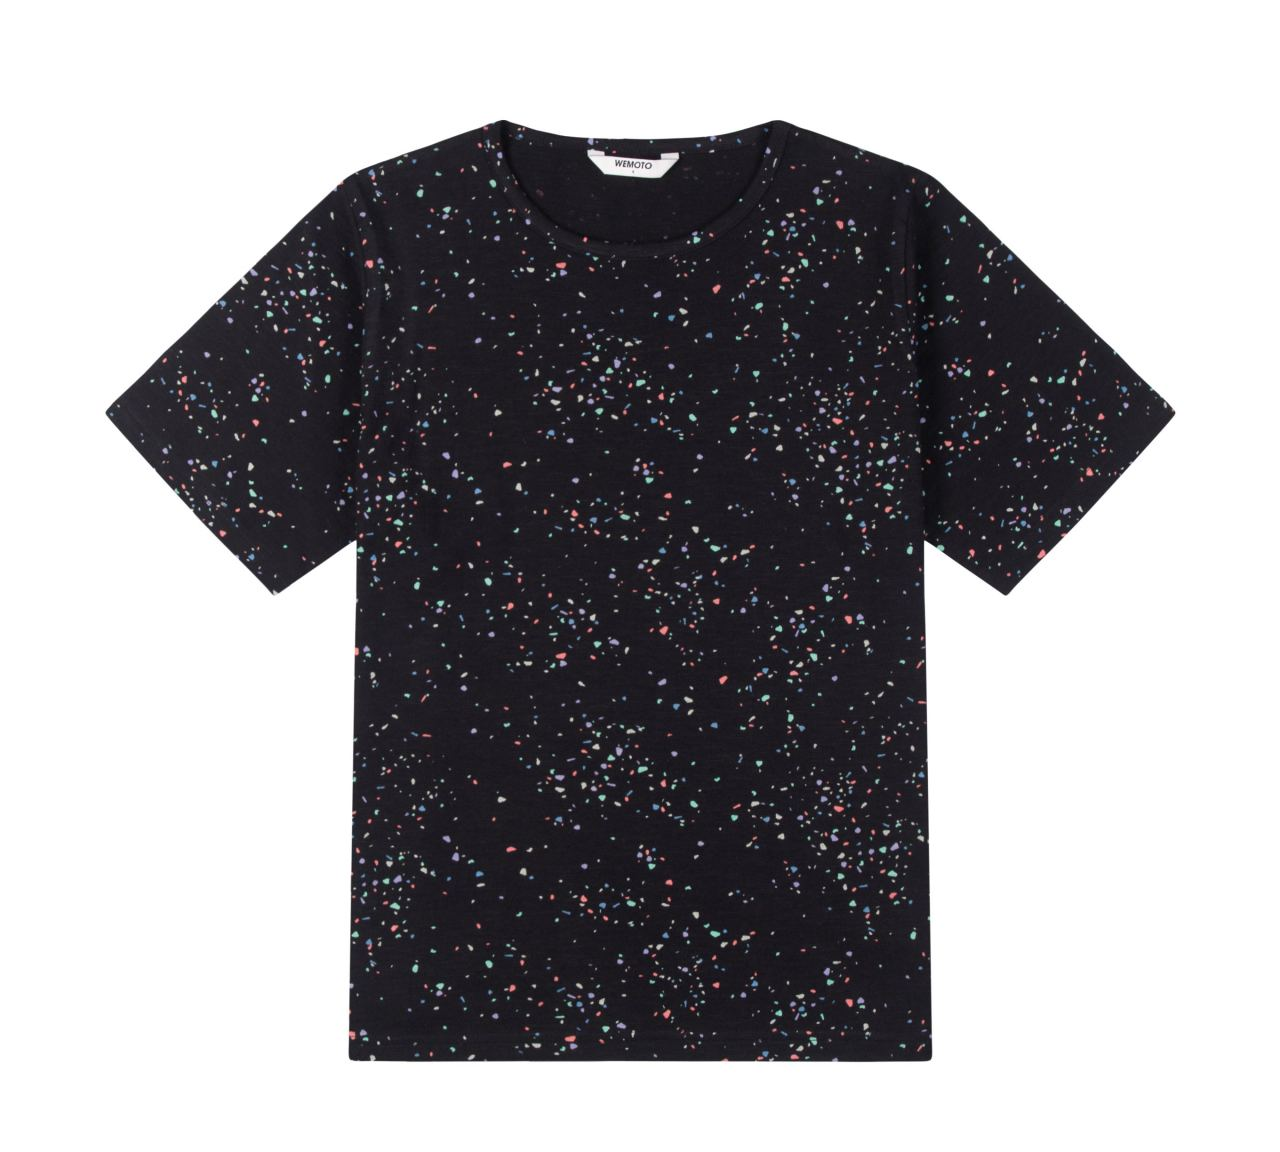 Holden Printed Shirt Black Multicolor